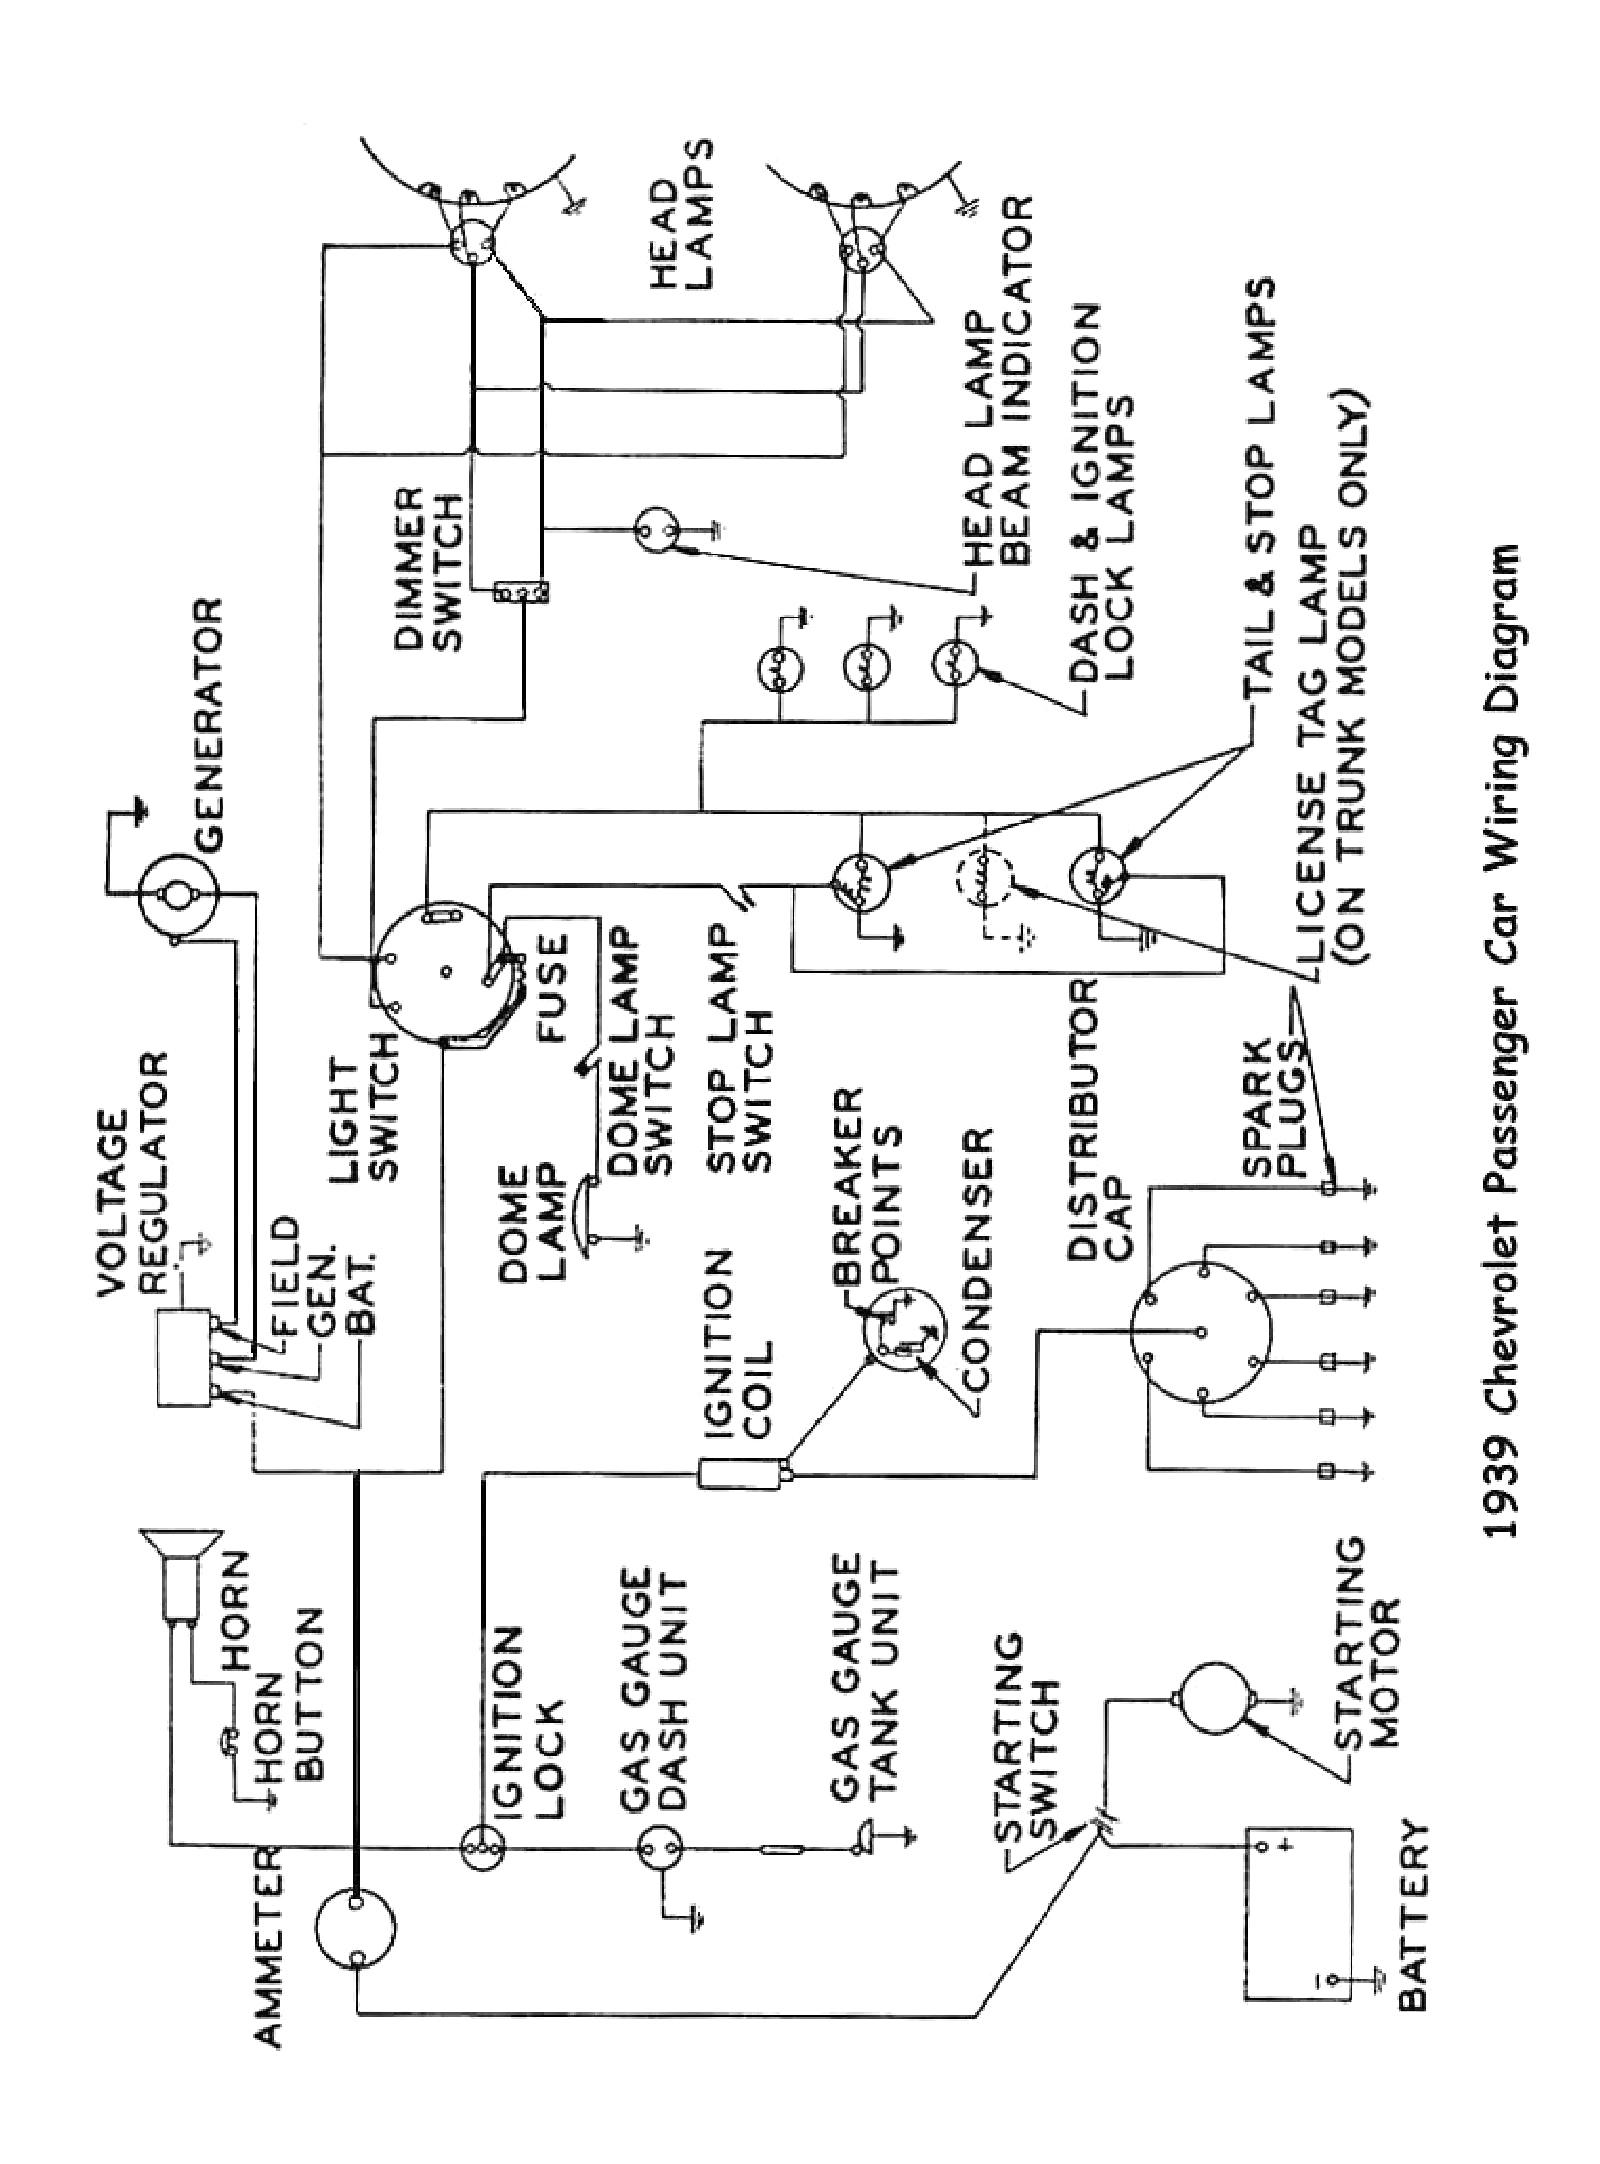 Low Voltage Lighting Wiring Diagram